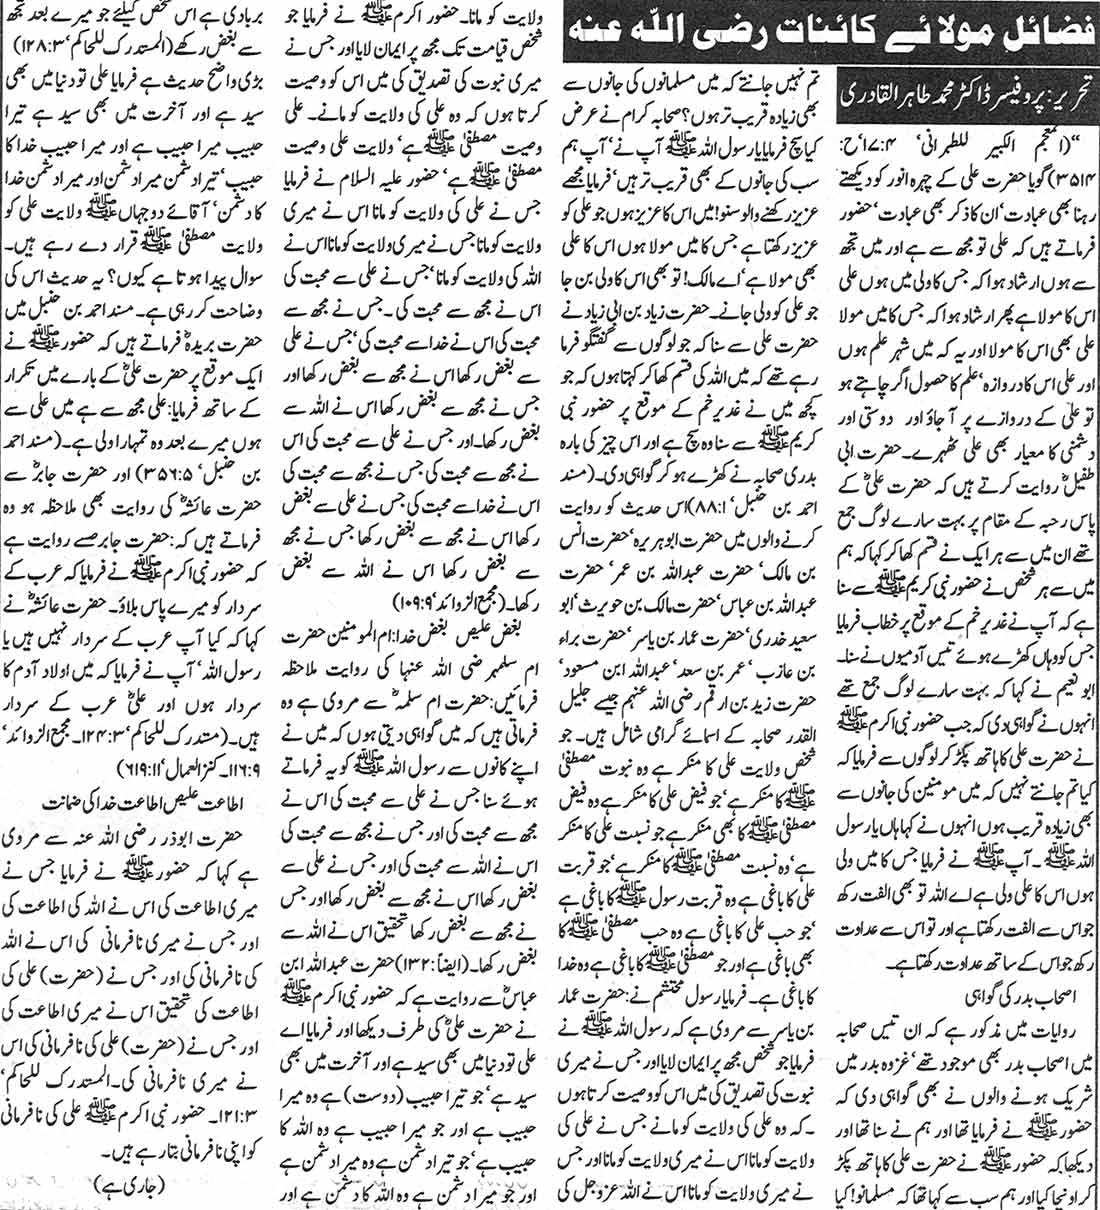 تحریک منہاج القرآن Minhaj-ul-Quran  Print Media Coverage پرنٹ میڈیا کوریج Daily Musawat